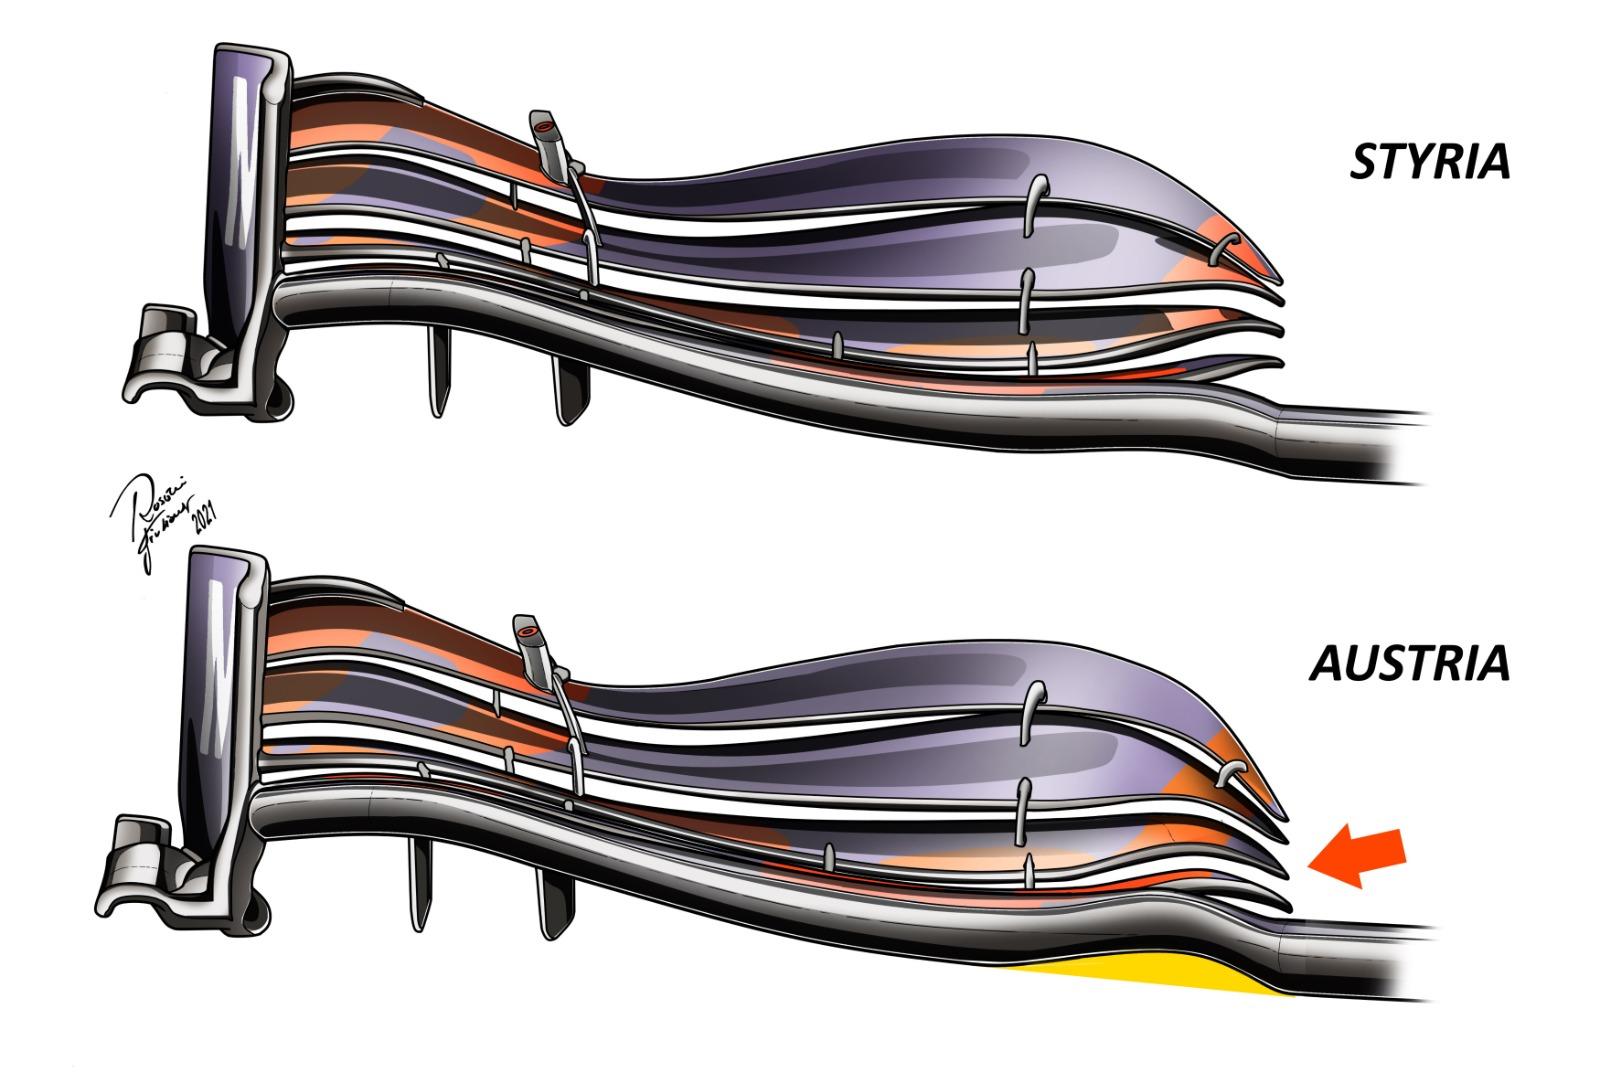 efficienza aerodinamica